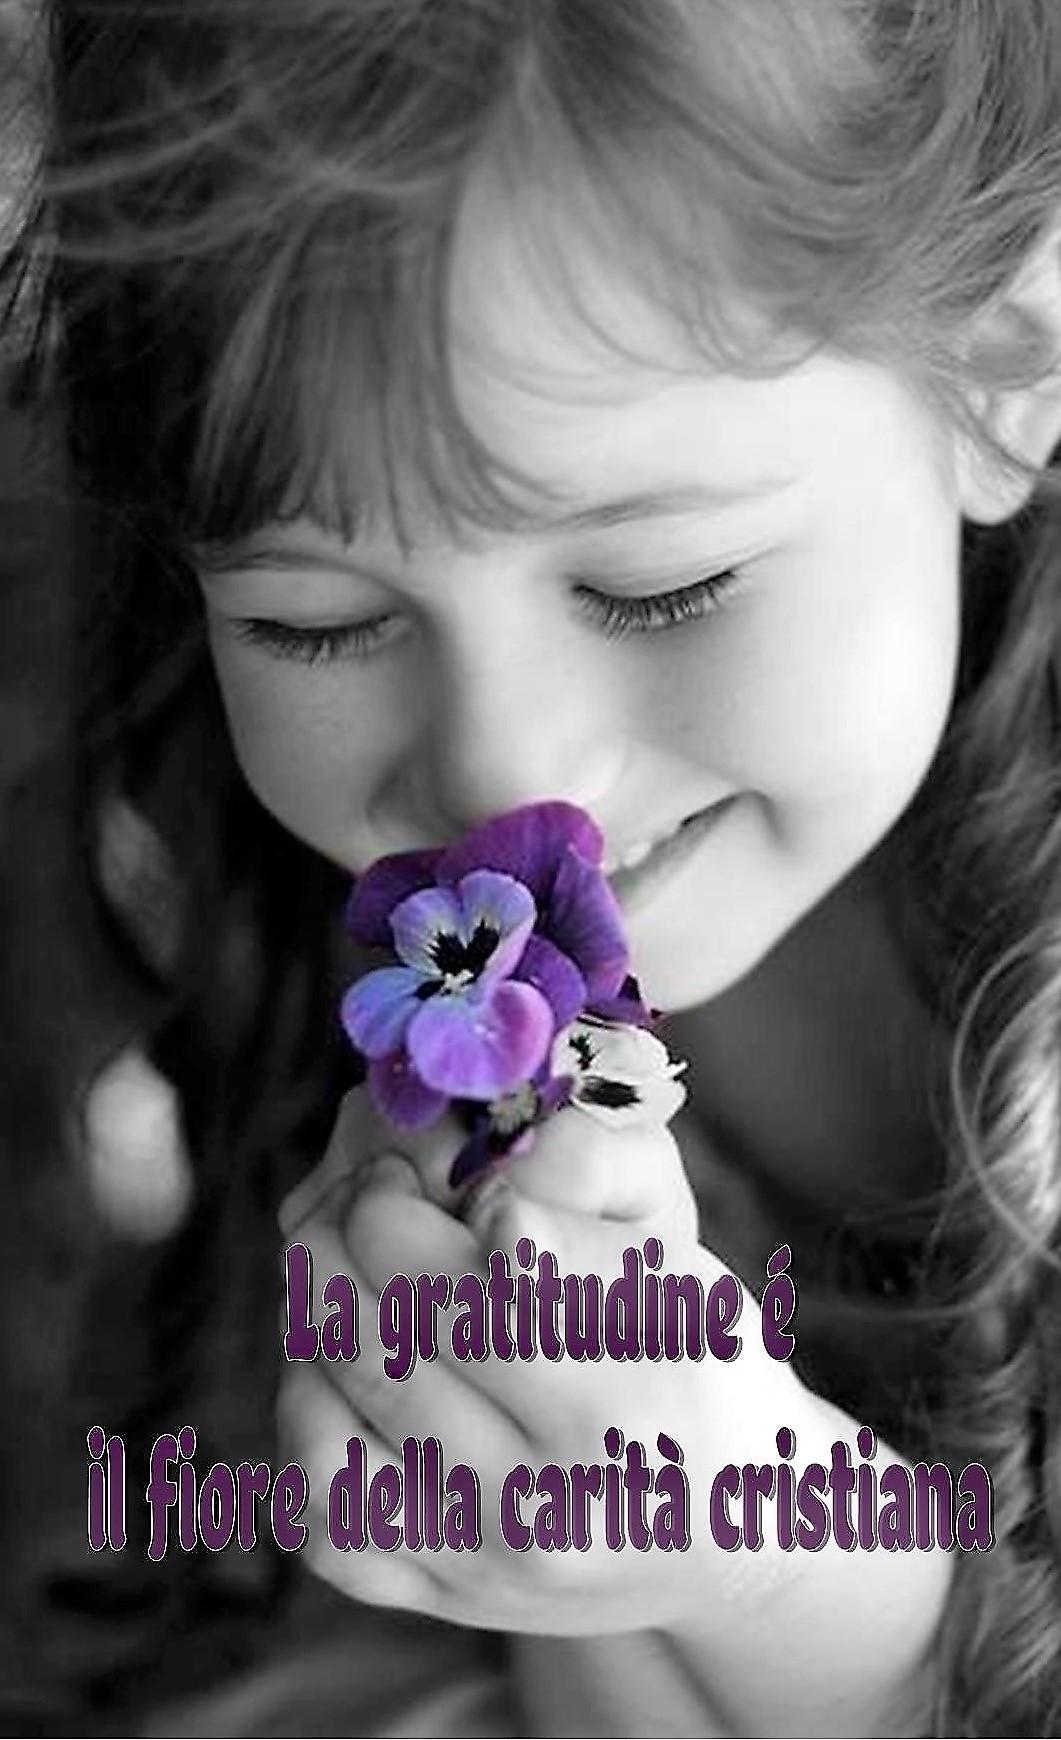 La gratitudine (2)